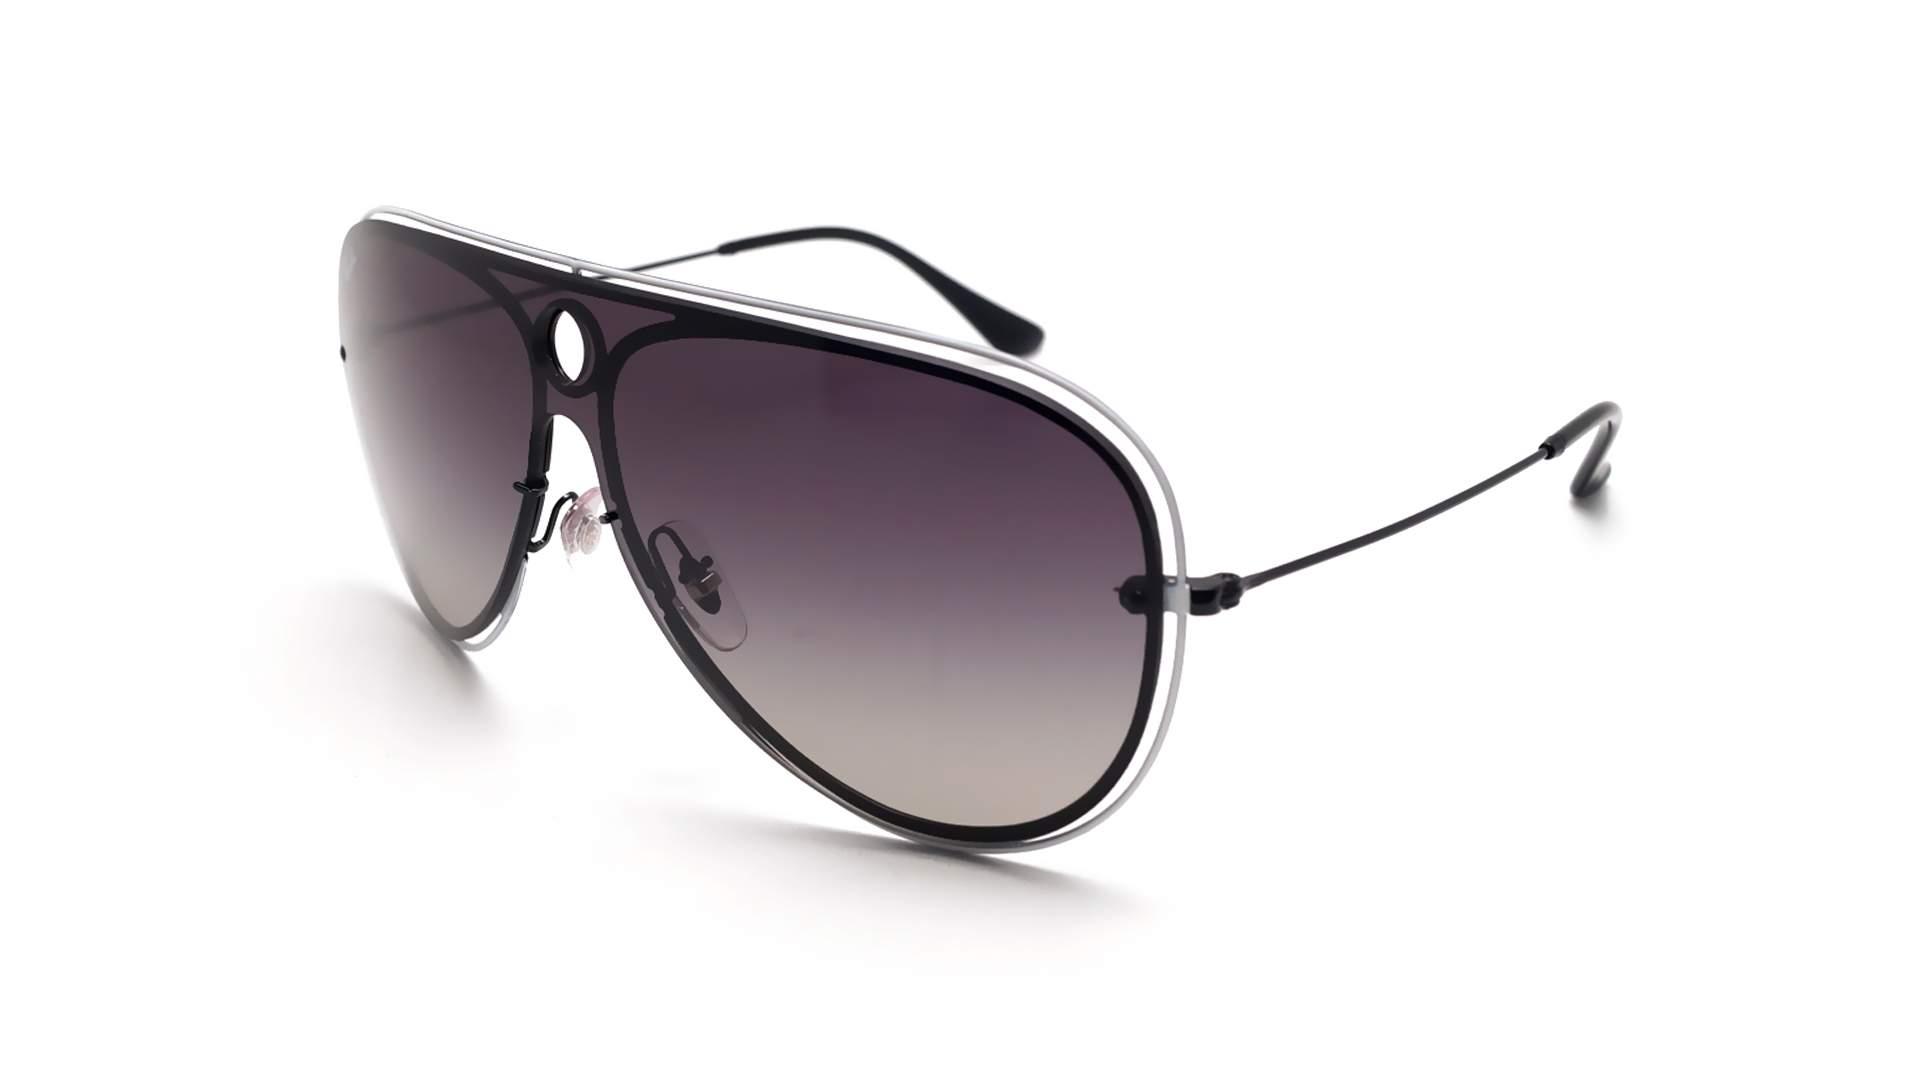 2ddd8e4ae6 Sunglasses Ray-Ban Shooter Blaze Black RB3605N 9095 11 32-20 Medium Gradient